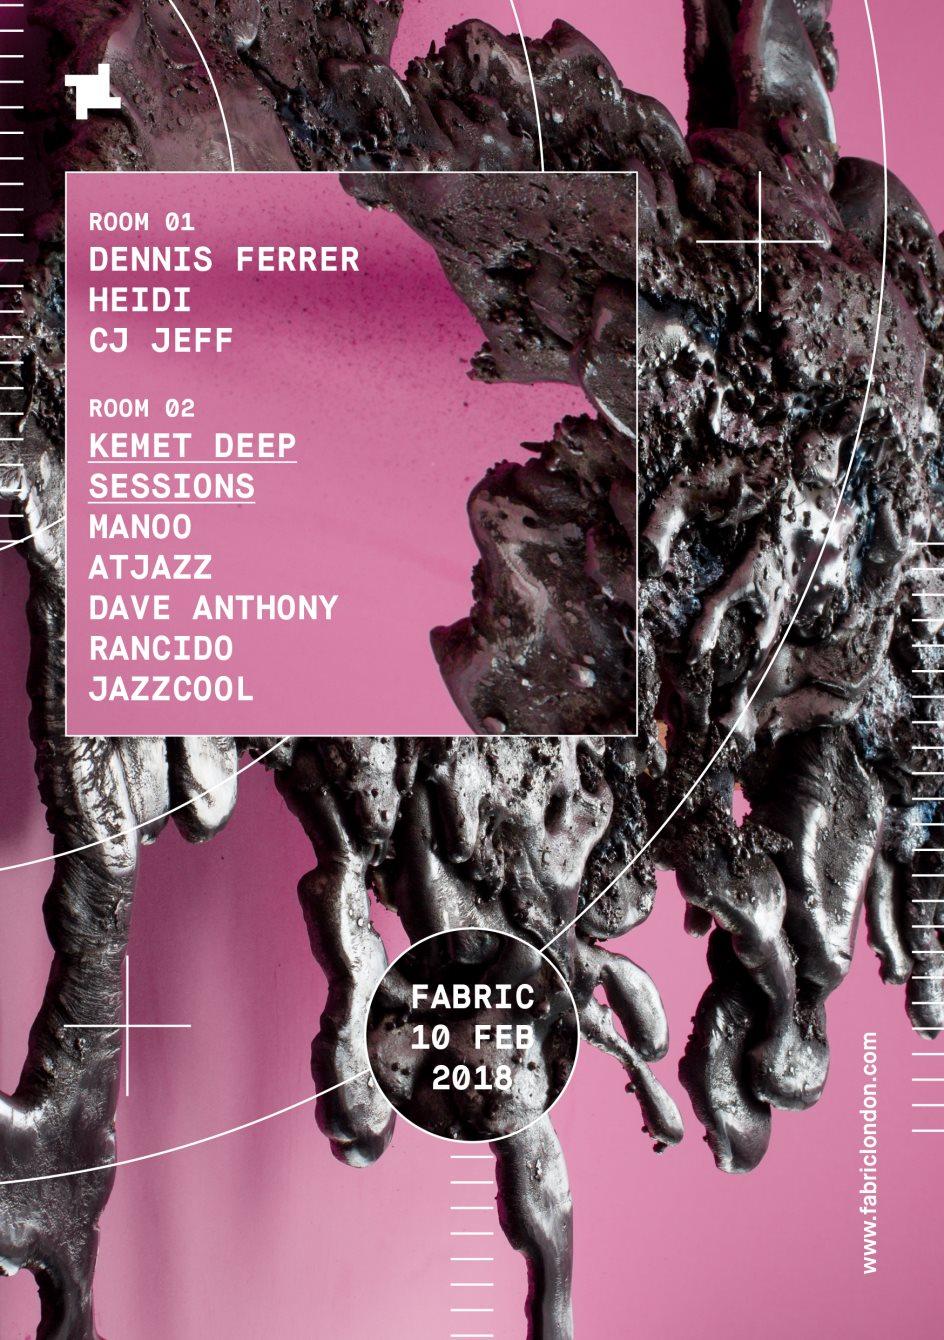 fabric: Dennis Ferrer, Heidi, CJ Jeff & Kemet Deep Sessions - Flyer back